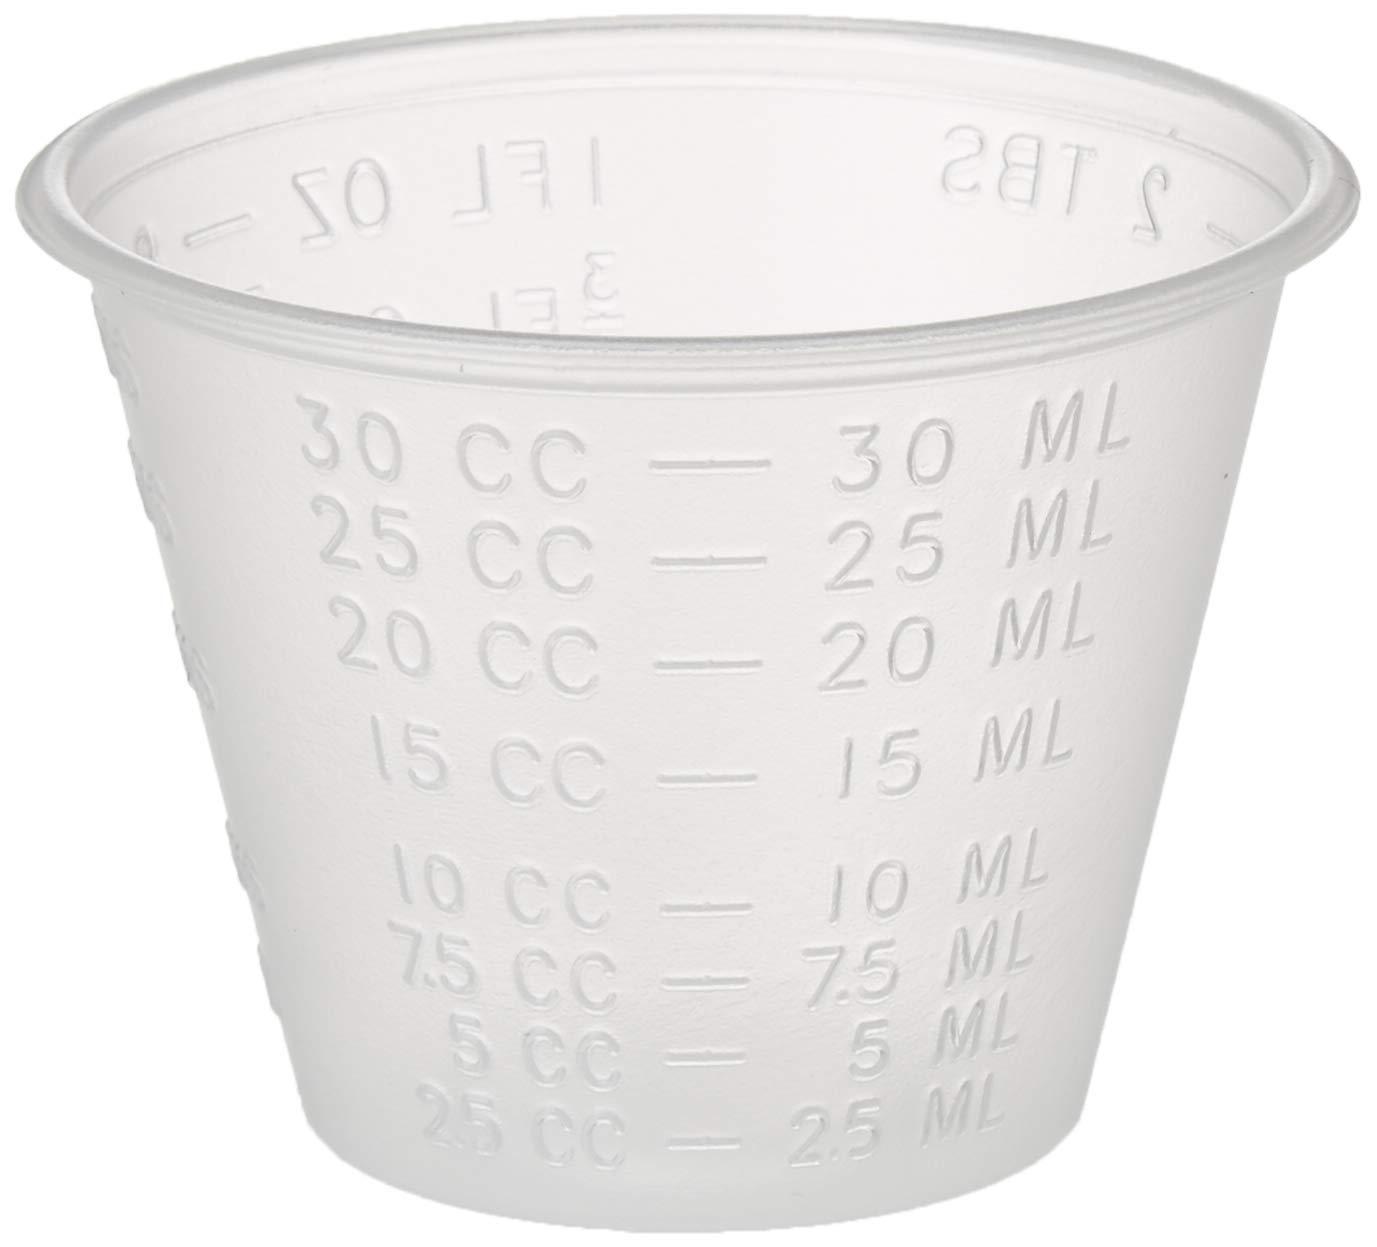 Dynarex 4258 Medicine Cup (Polyethylene), 100 Count, 1 Sleeve, Clear: Industrial & Scientific